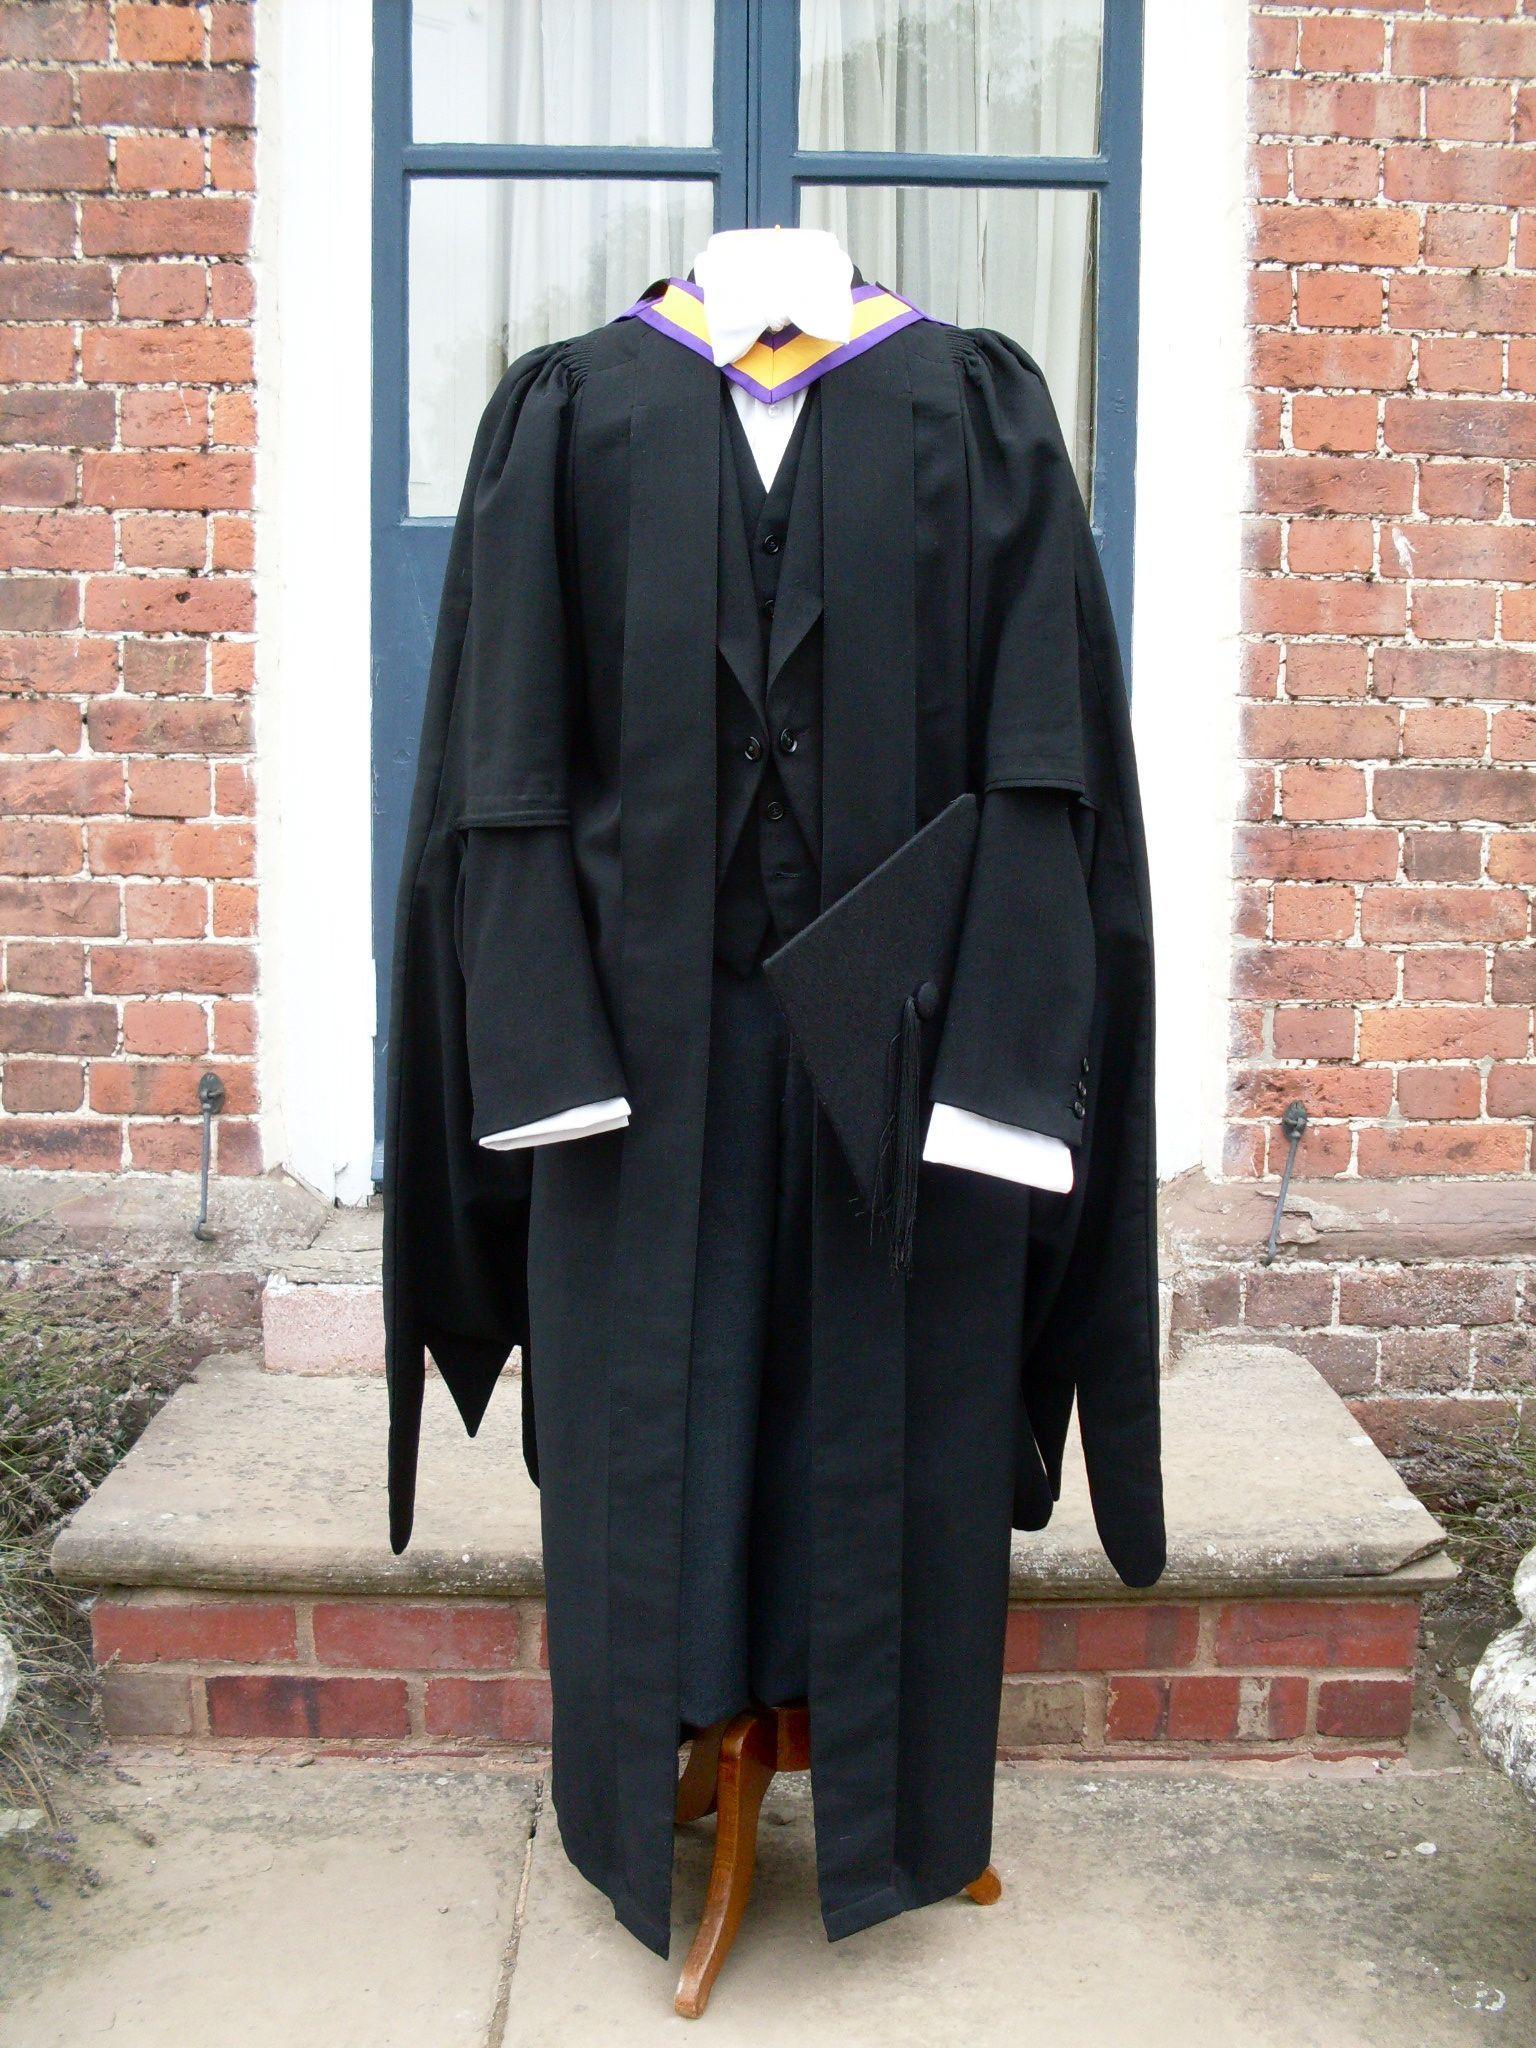 Academic Dress | Art of Clothing | Pinterest